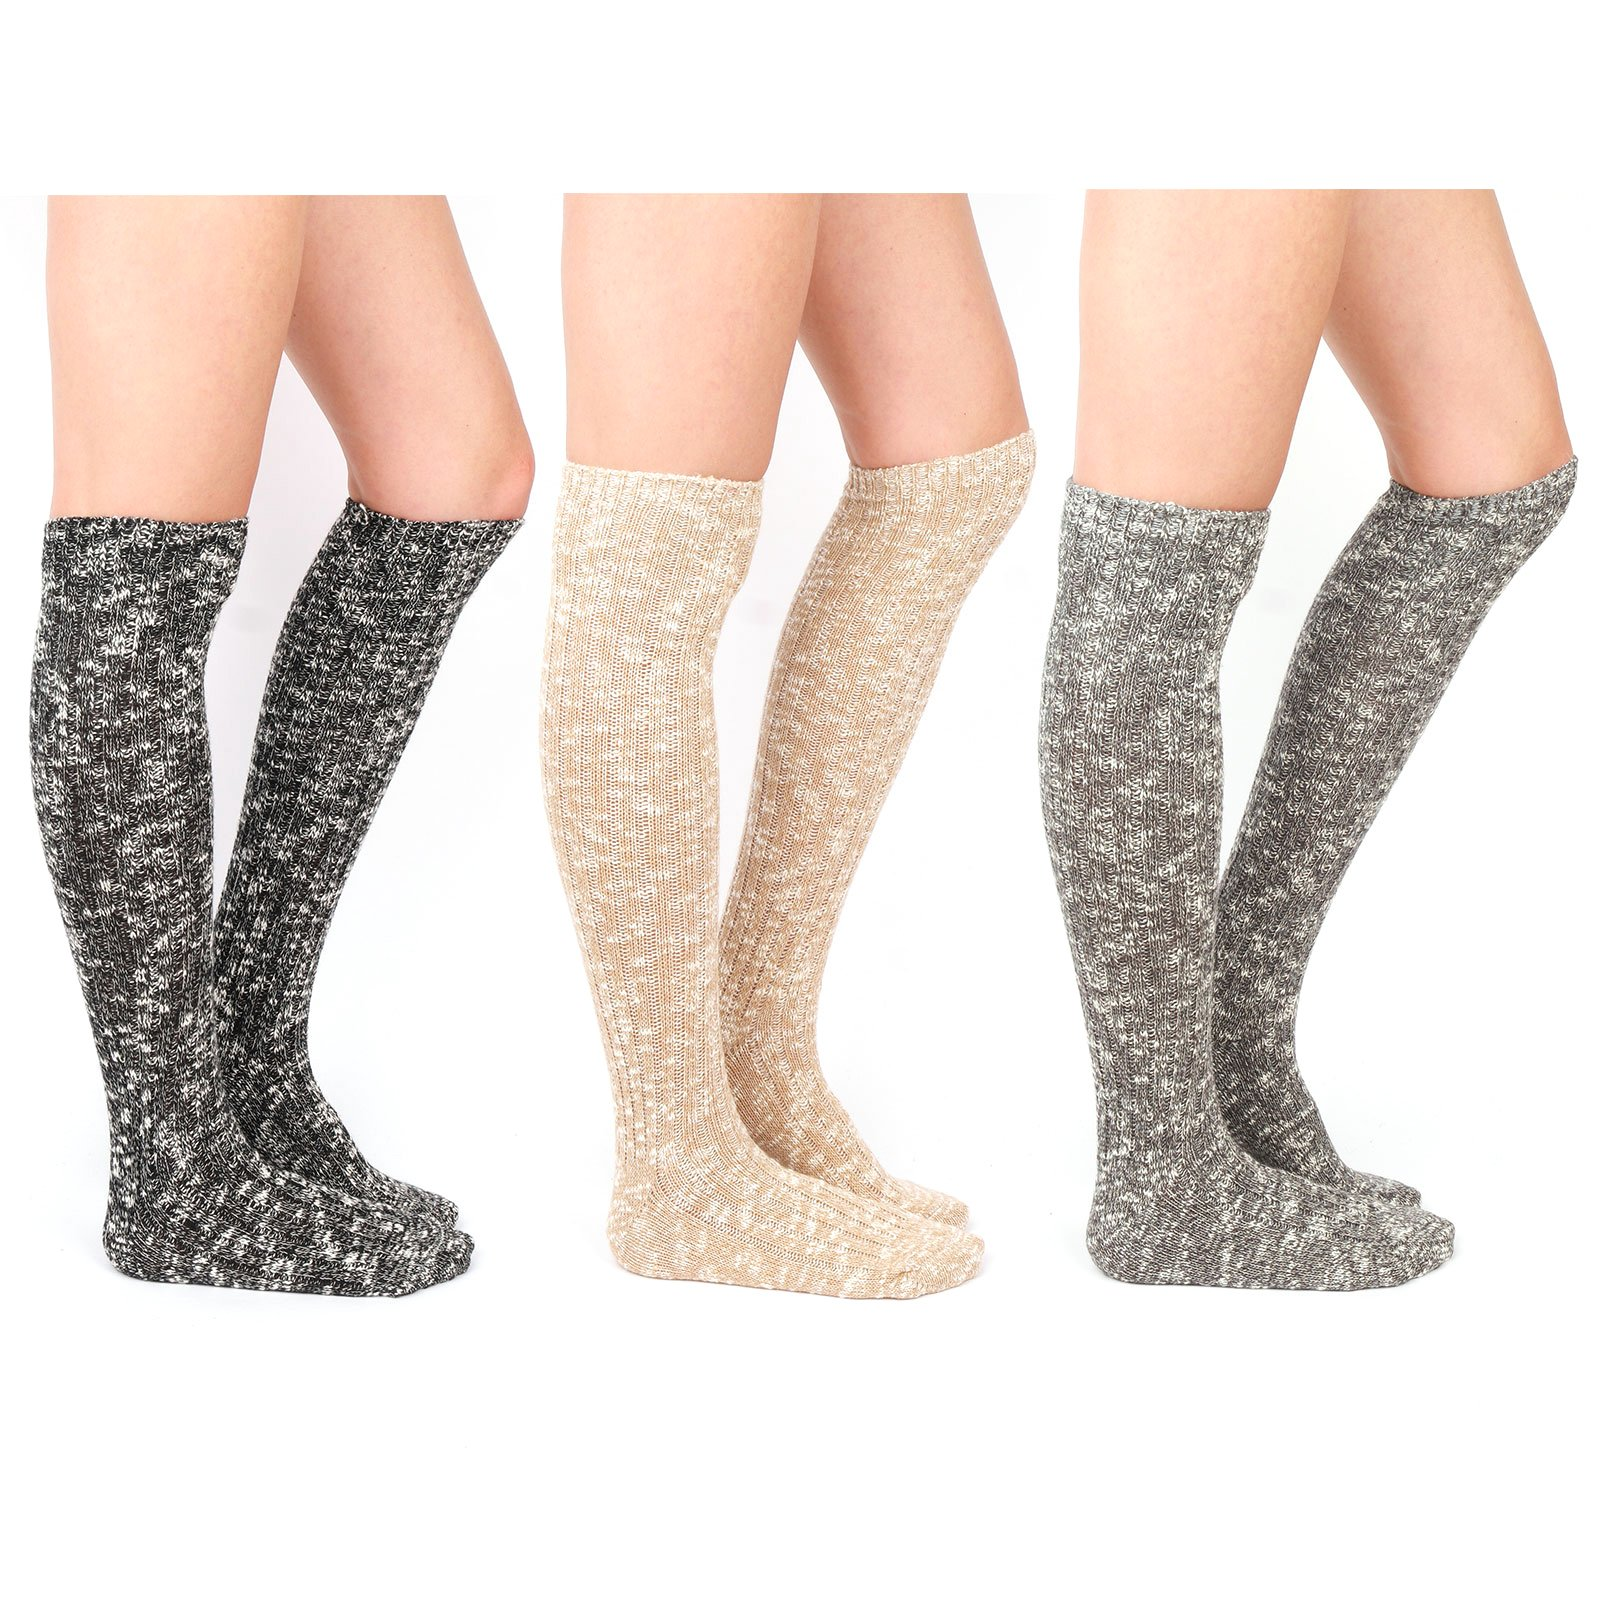 WOWFOOT Women's Knee High Wool Socks Soft Warm Thick Thermal Girl Winter Cushion Crew Quarter (A-Muti Pack 3pairs(Black,Gray,Light-Brown))